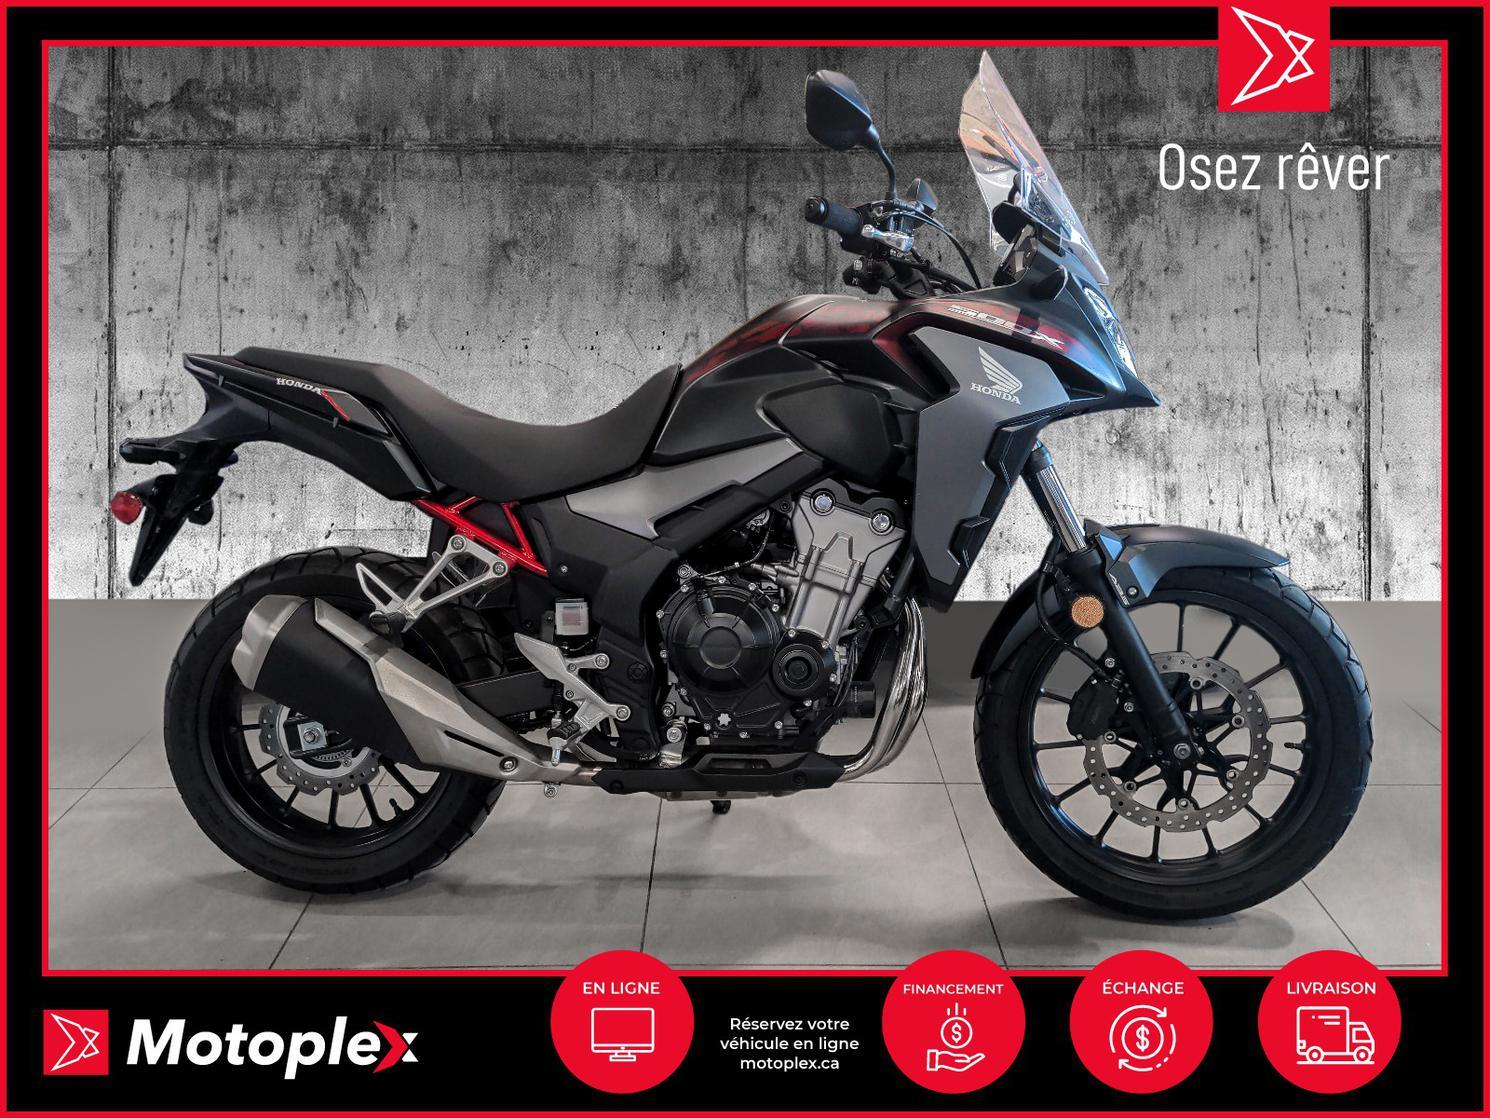 2021 Honda CBX 500 - 38$/semaine